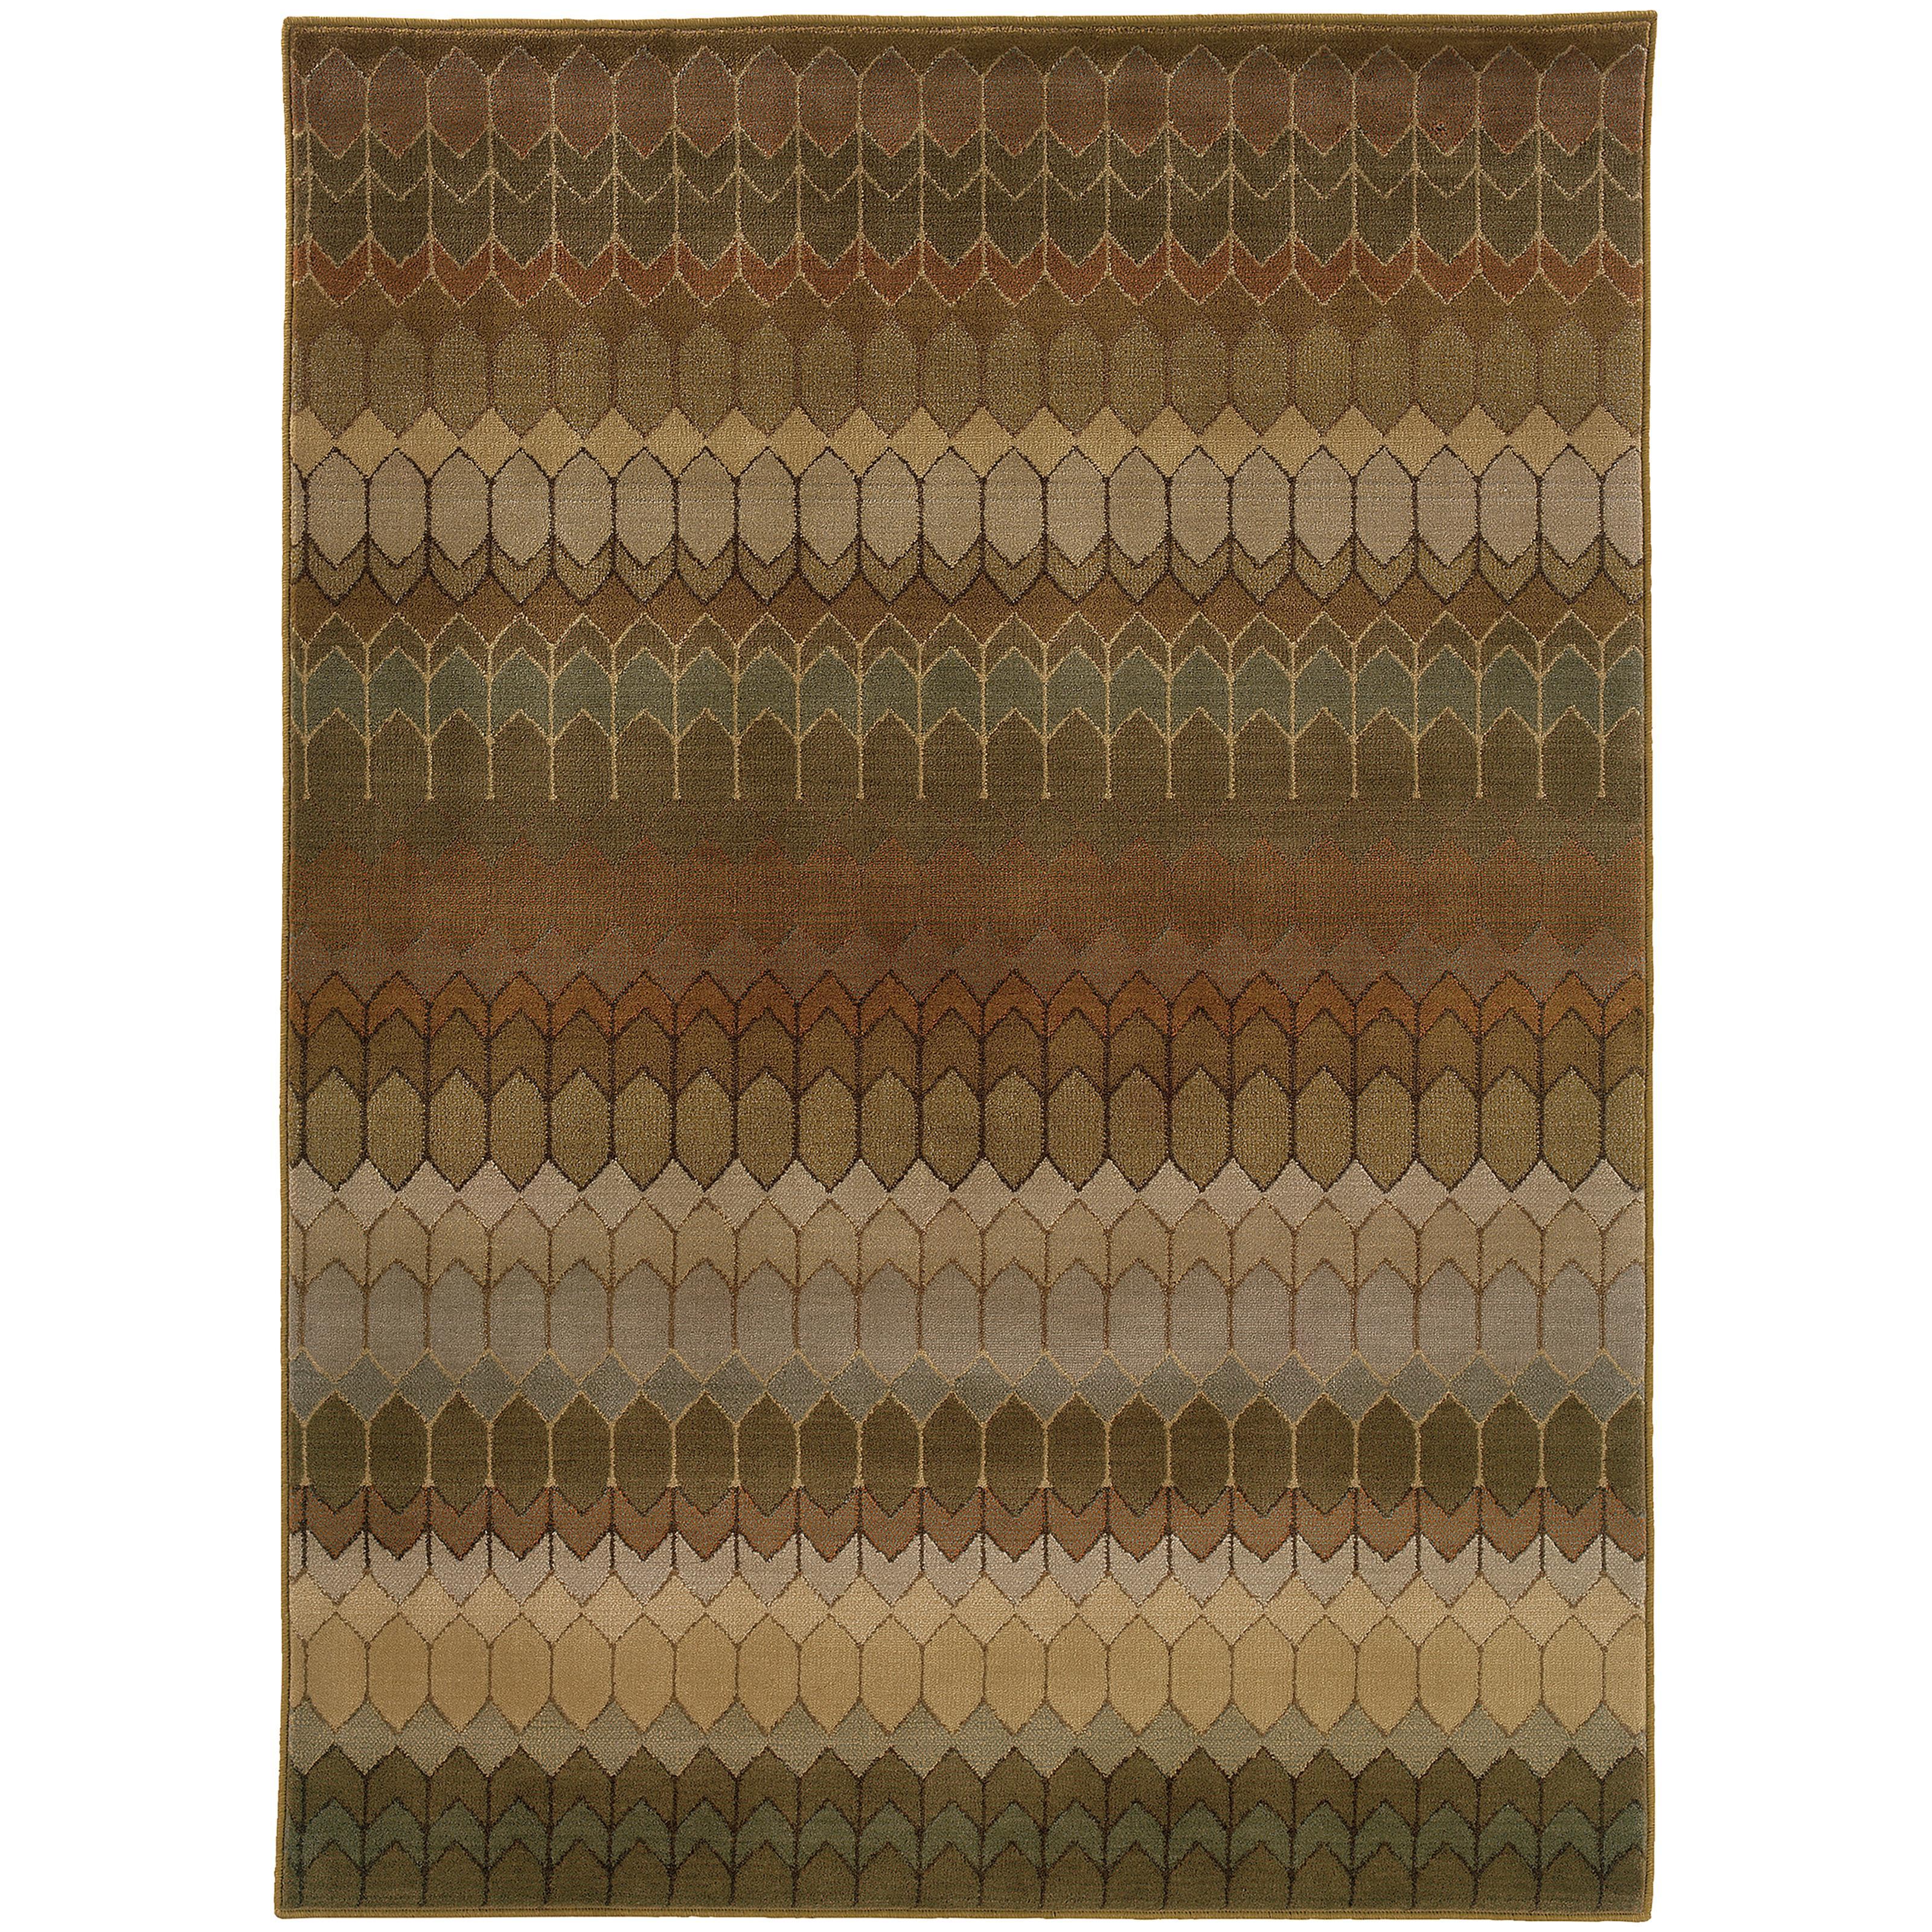 "Oriental Weavers Casablanca 9'10"" X 12'10"" Rug - Item Number: C4455A300390ST"